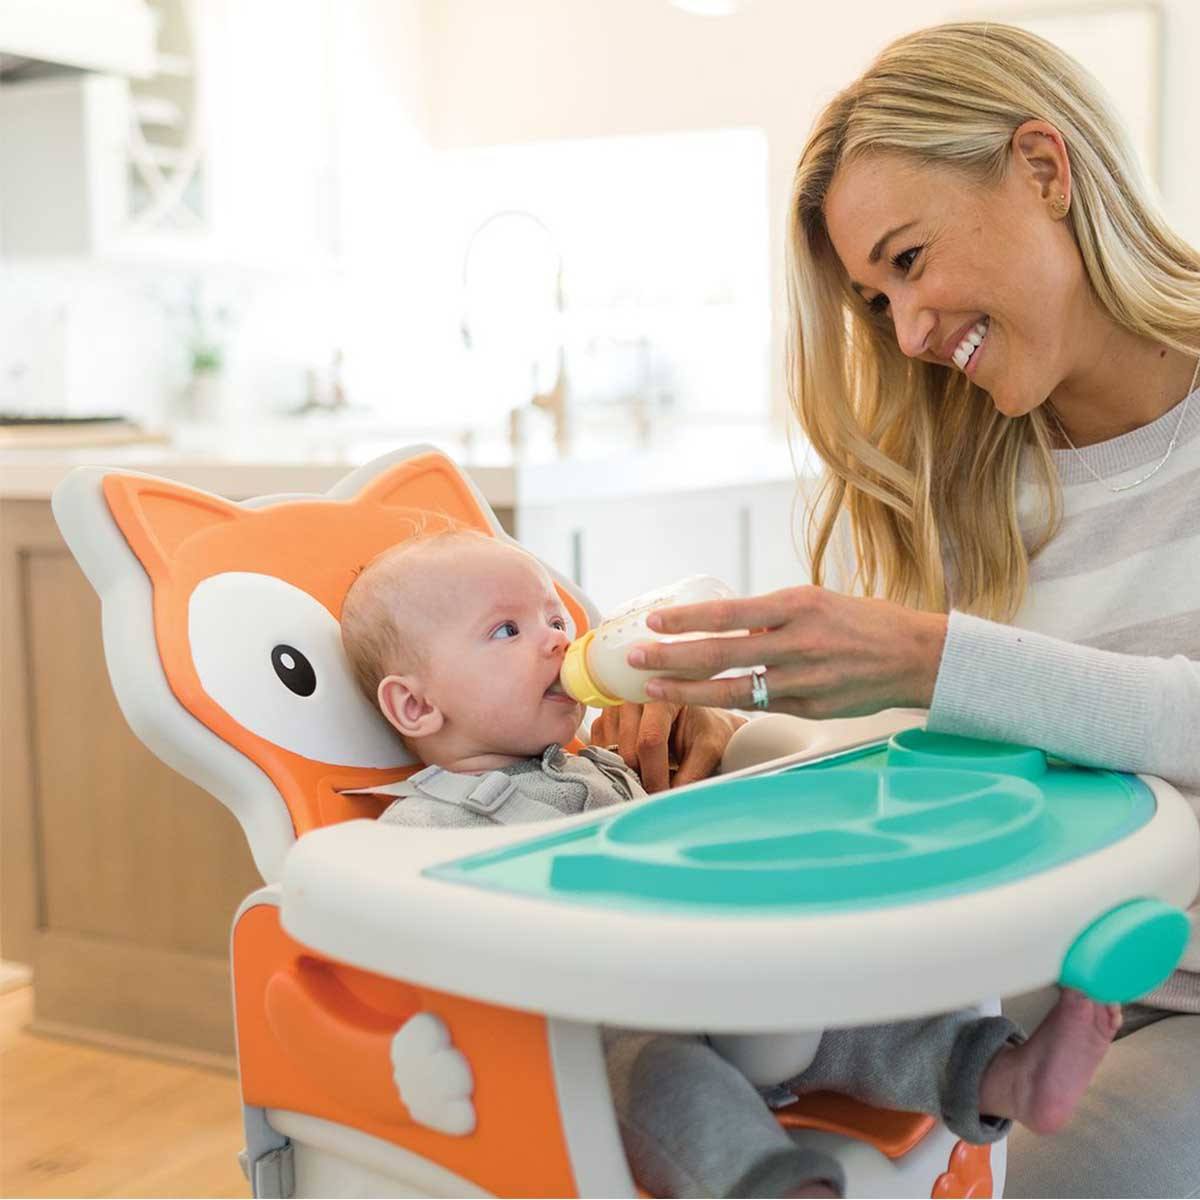 Infantino multifunkcionalna hranilica, 4u1 Grow with me